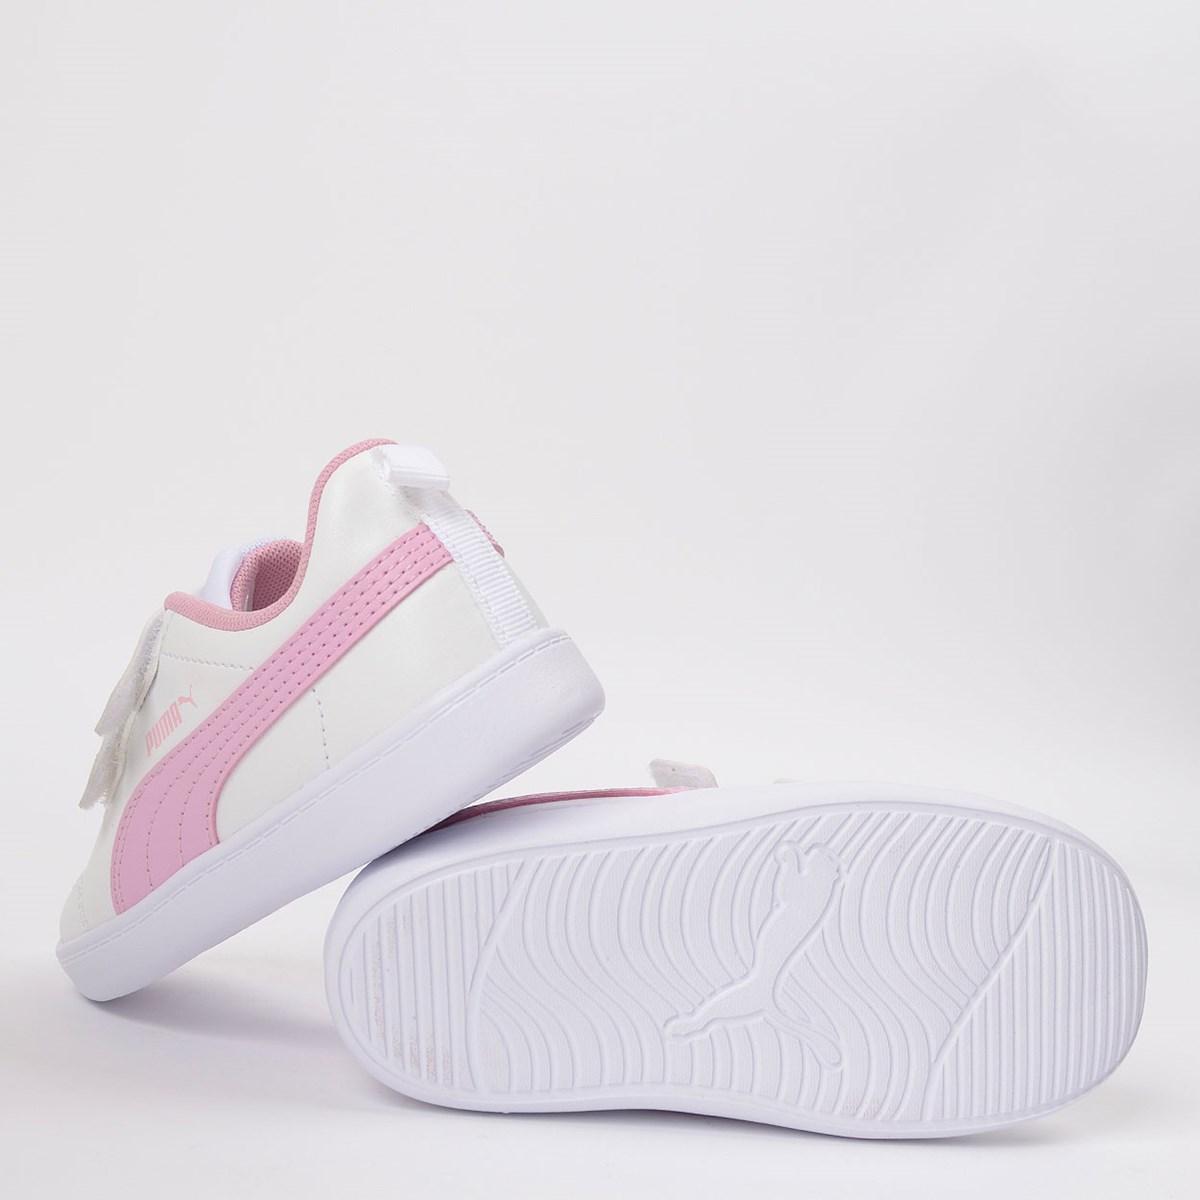 Tênis Puma Kids Courtflex V2 V White Pale Pink 371544-11